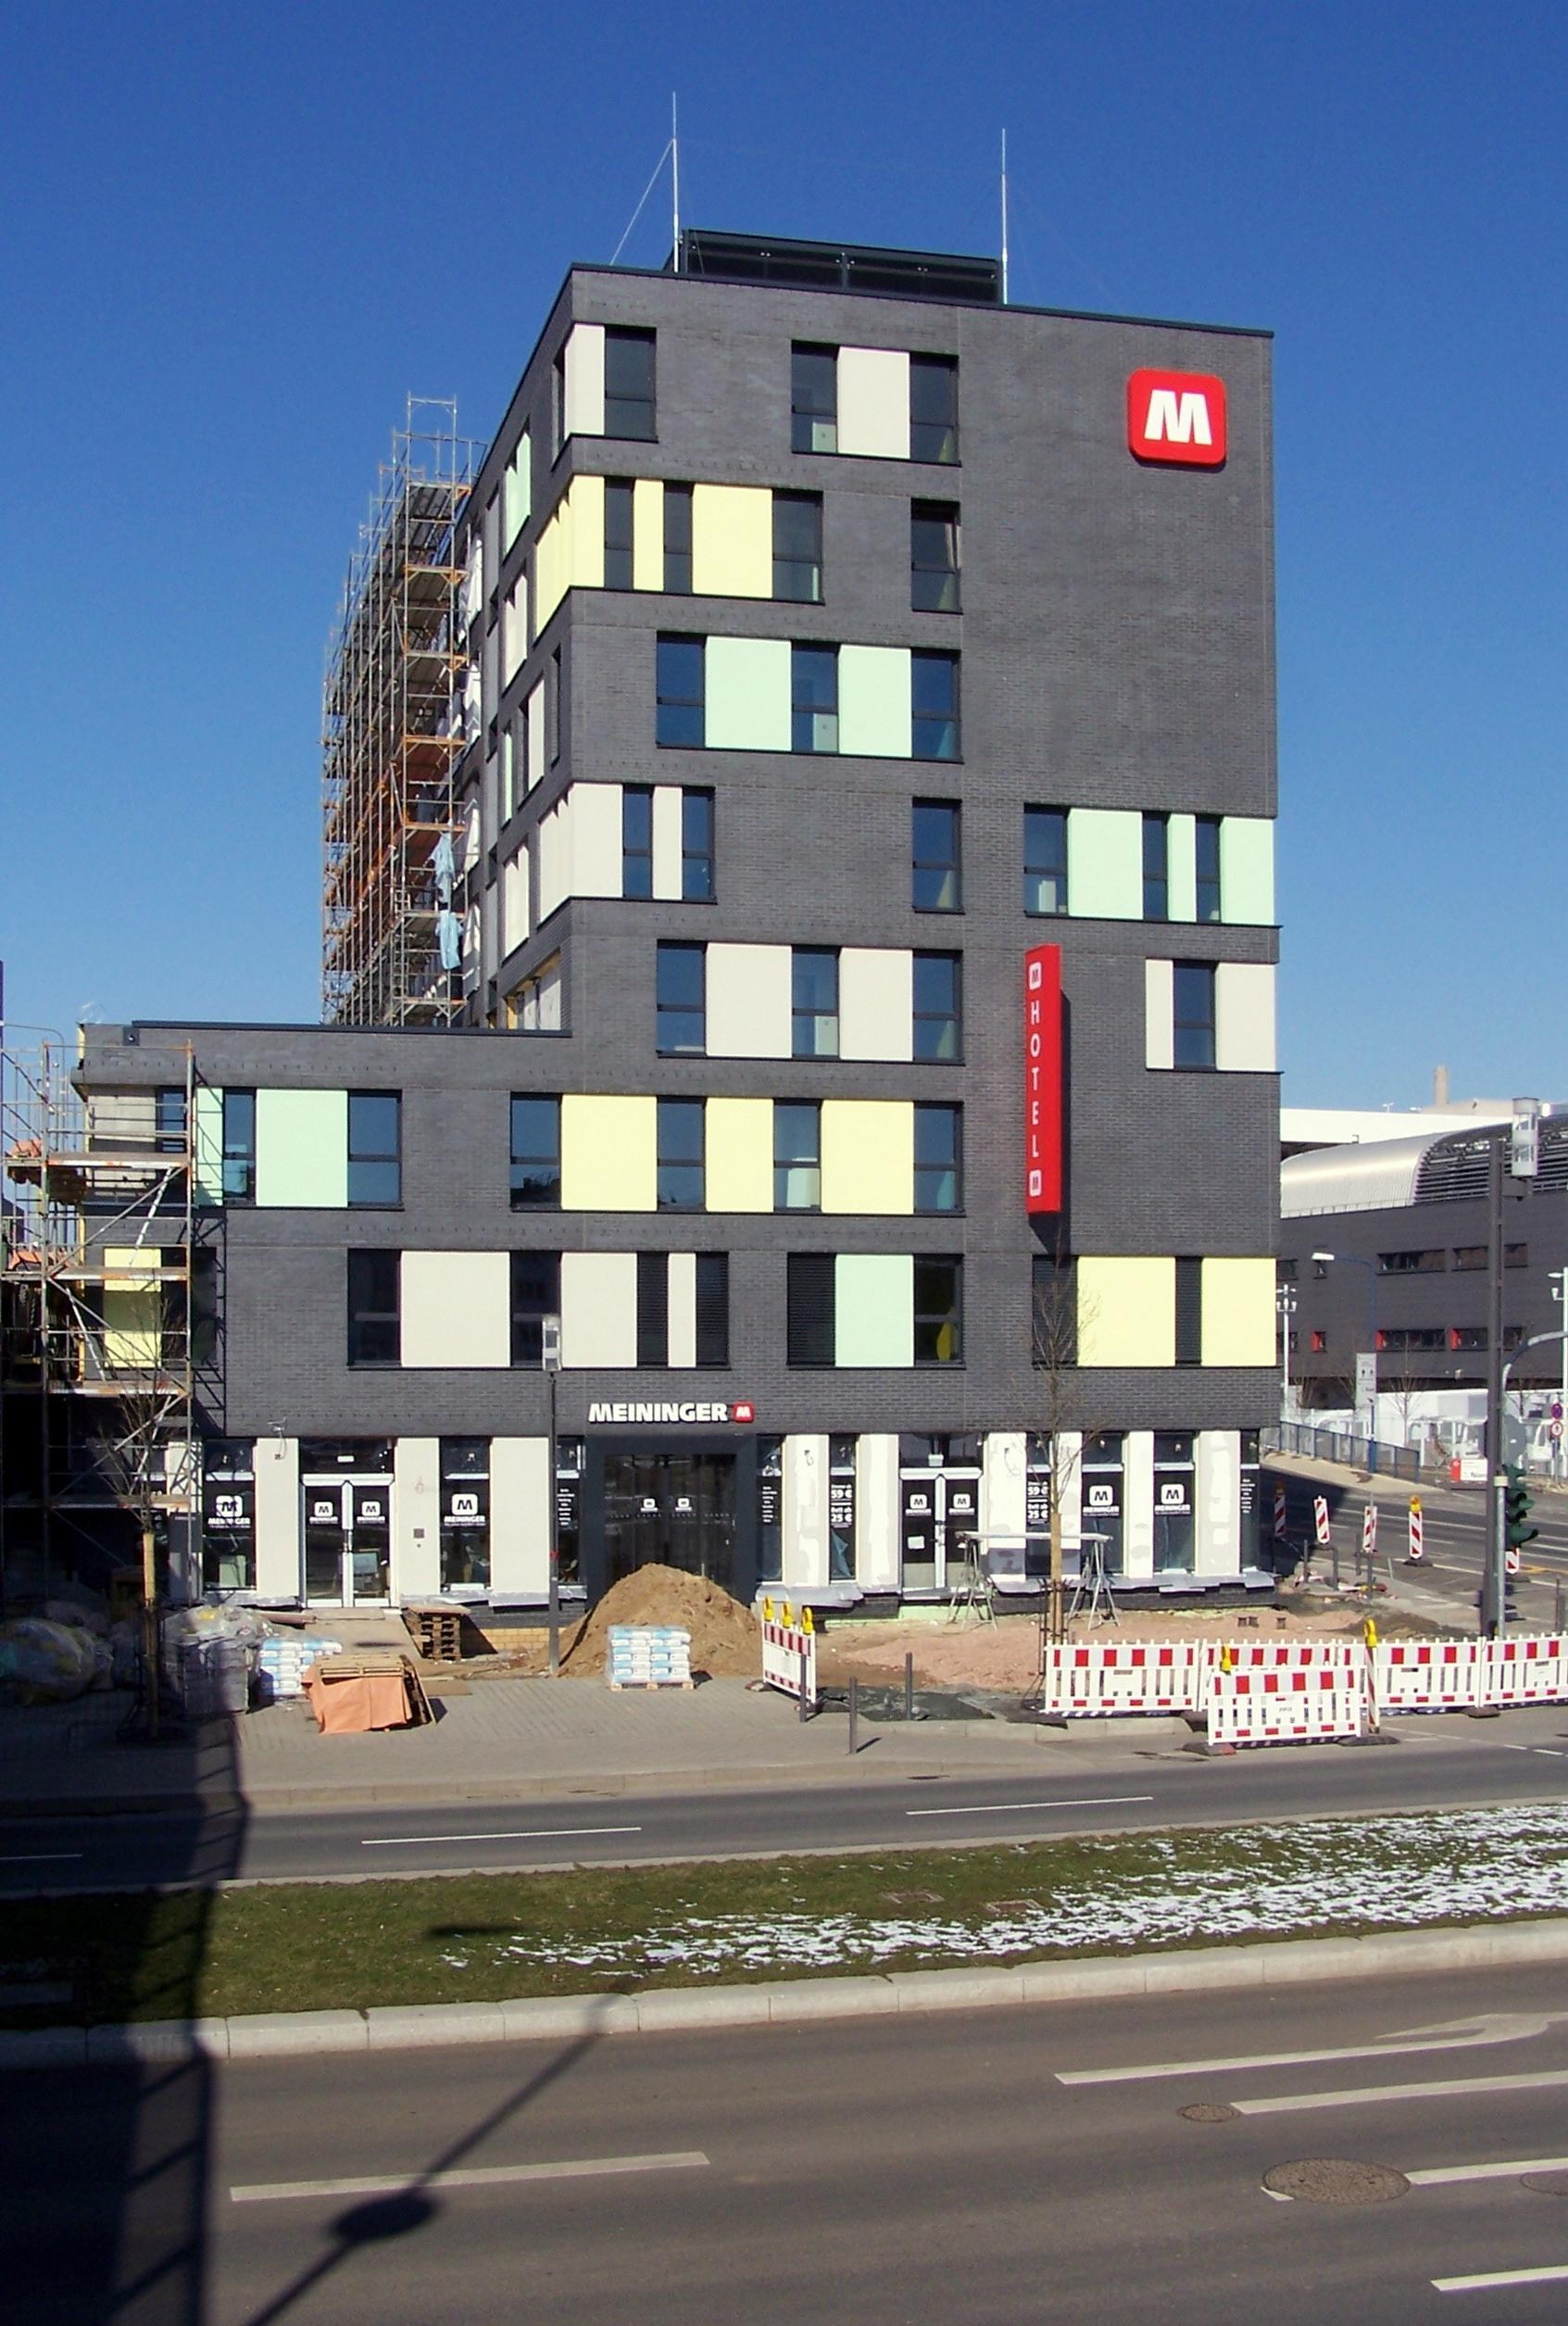 Hotel Frankfurt Meininger